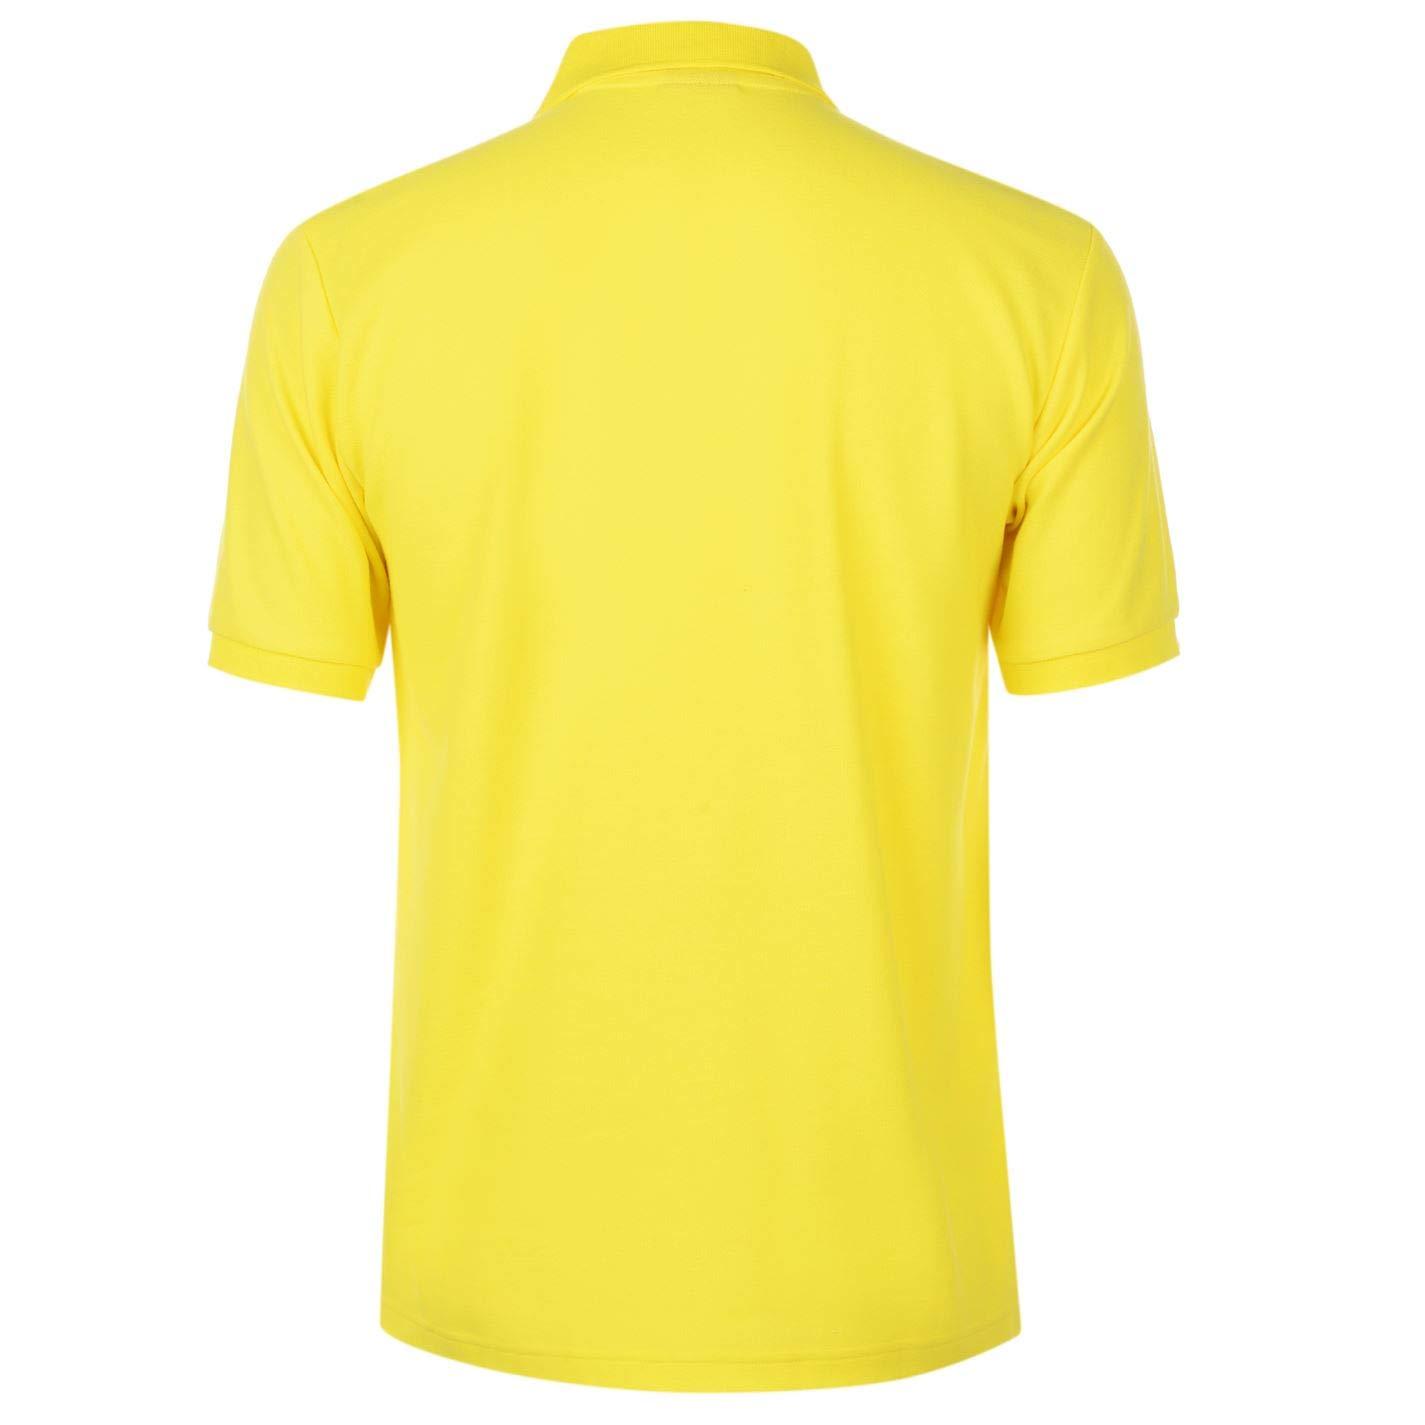 Slazenger Hombre Plain Camiseta Polo Amarillo S: Amazon.es: Ropa y ...